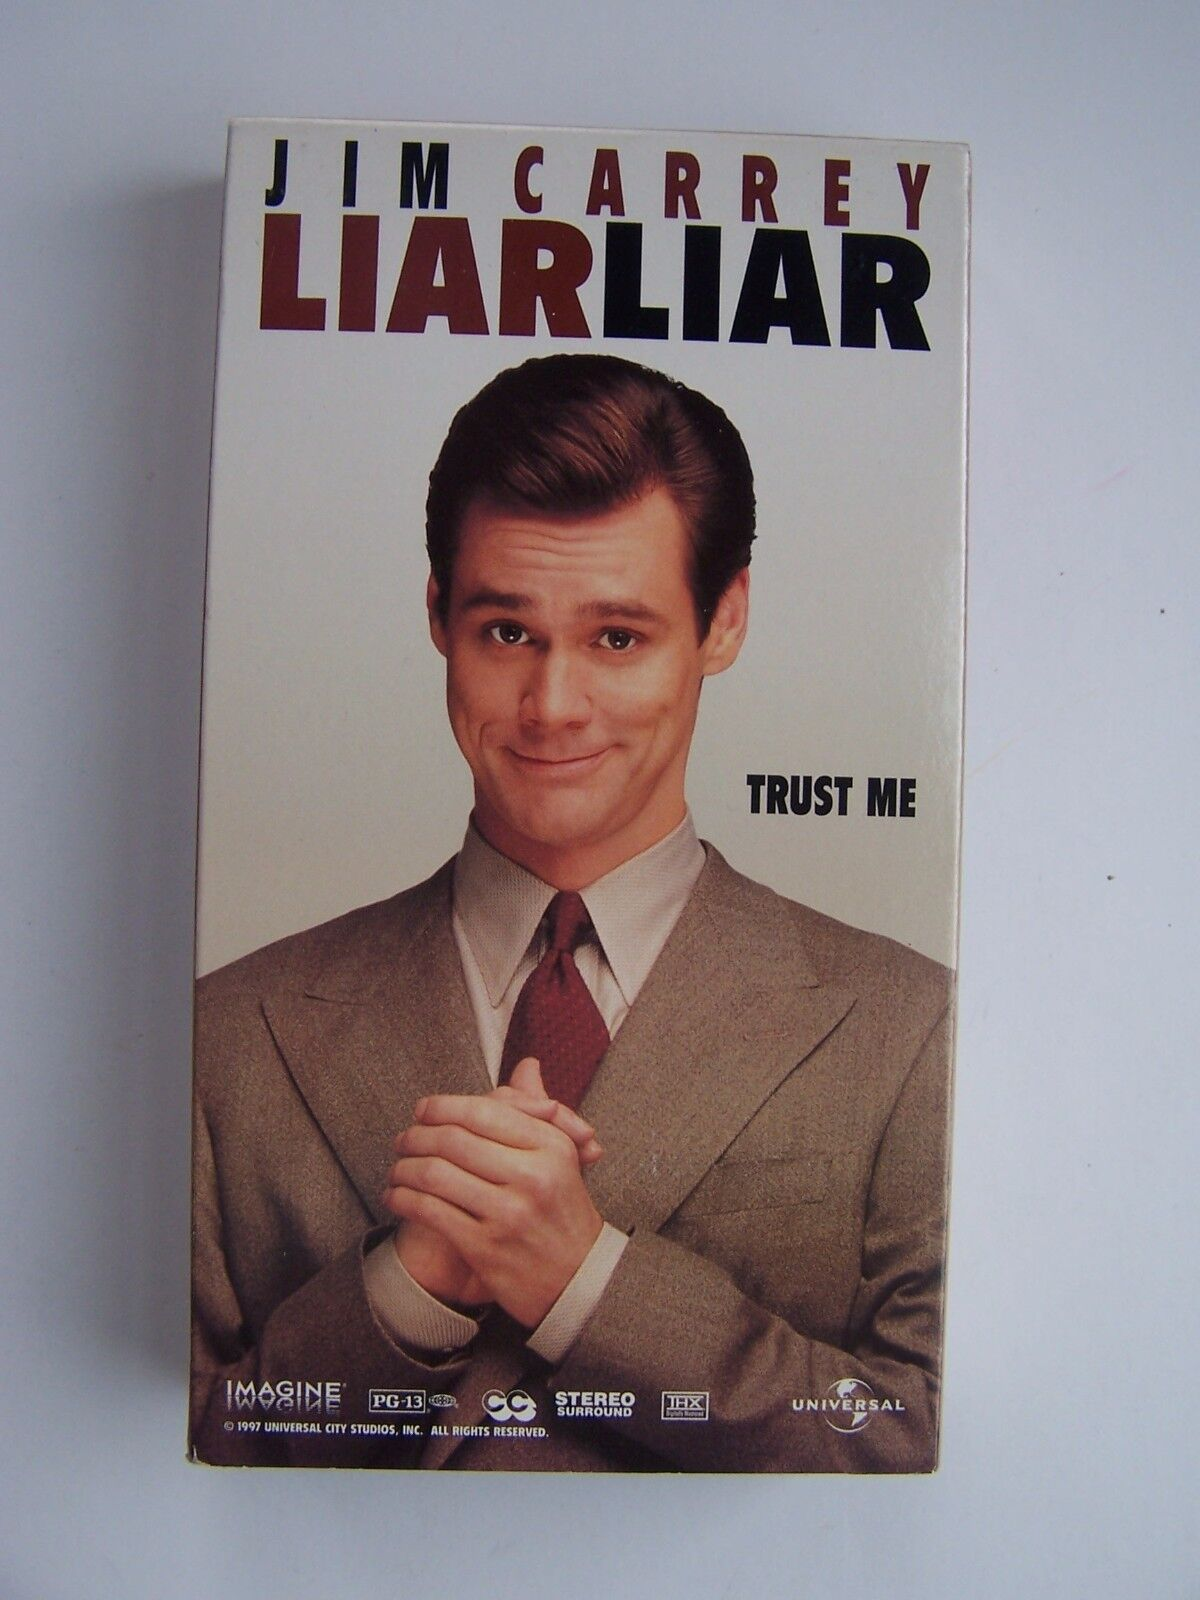 Liar Liar VHS Video Tape Movie Jim Carrey